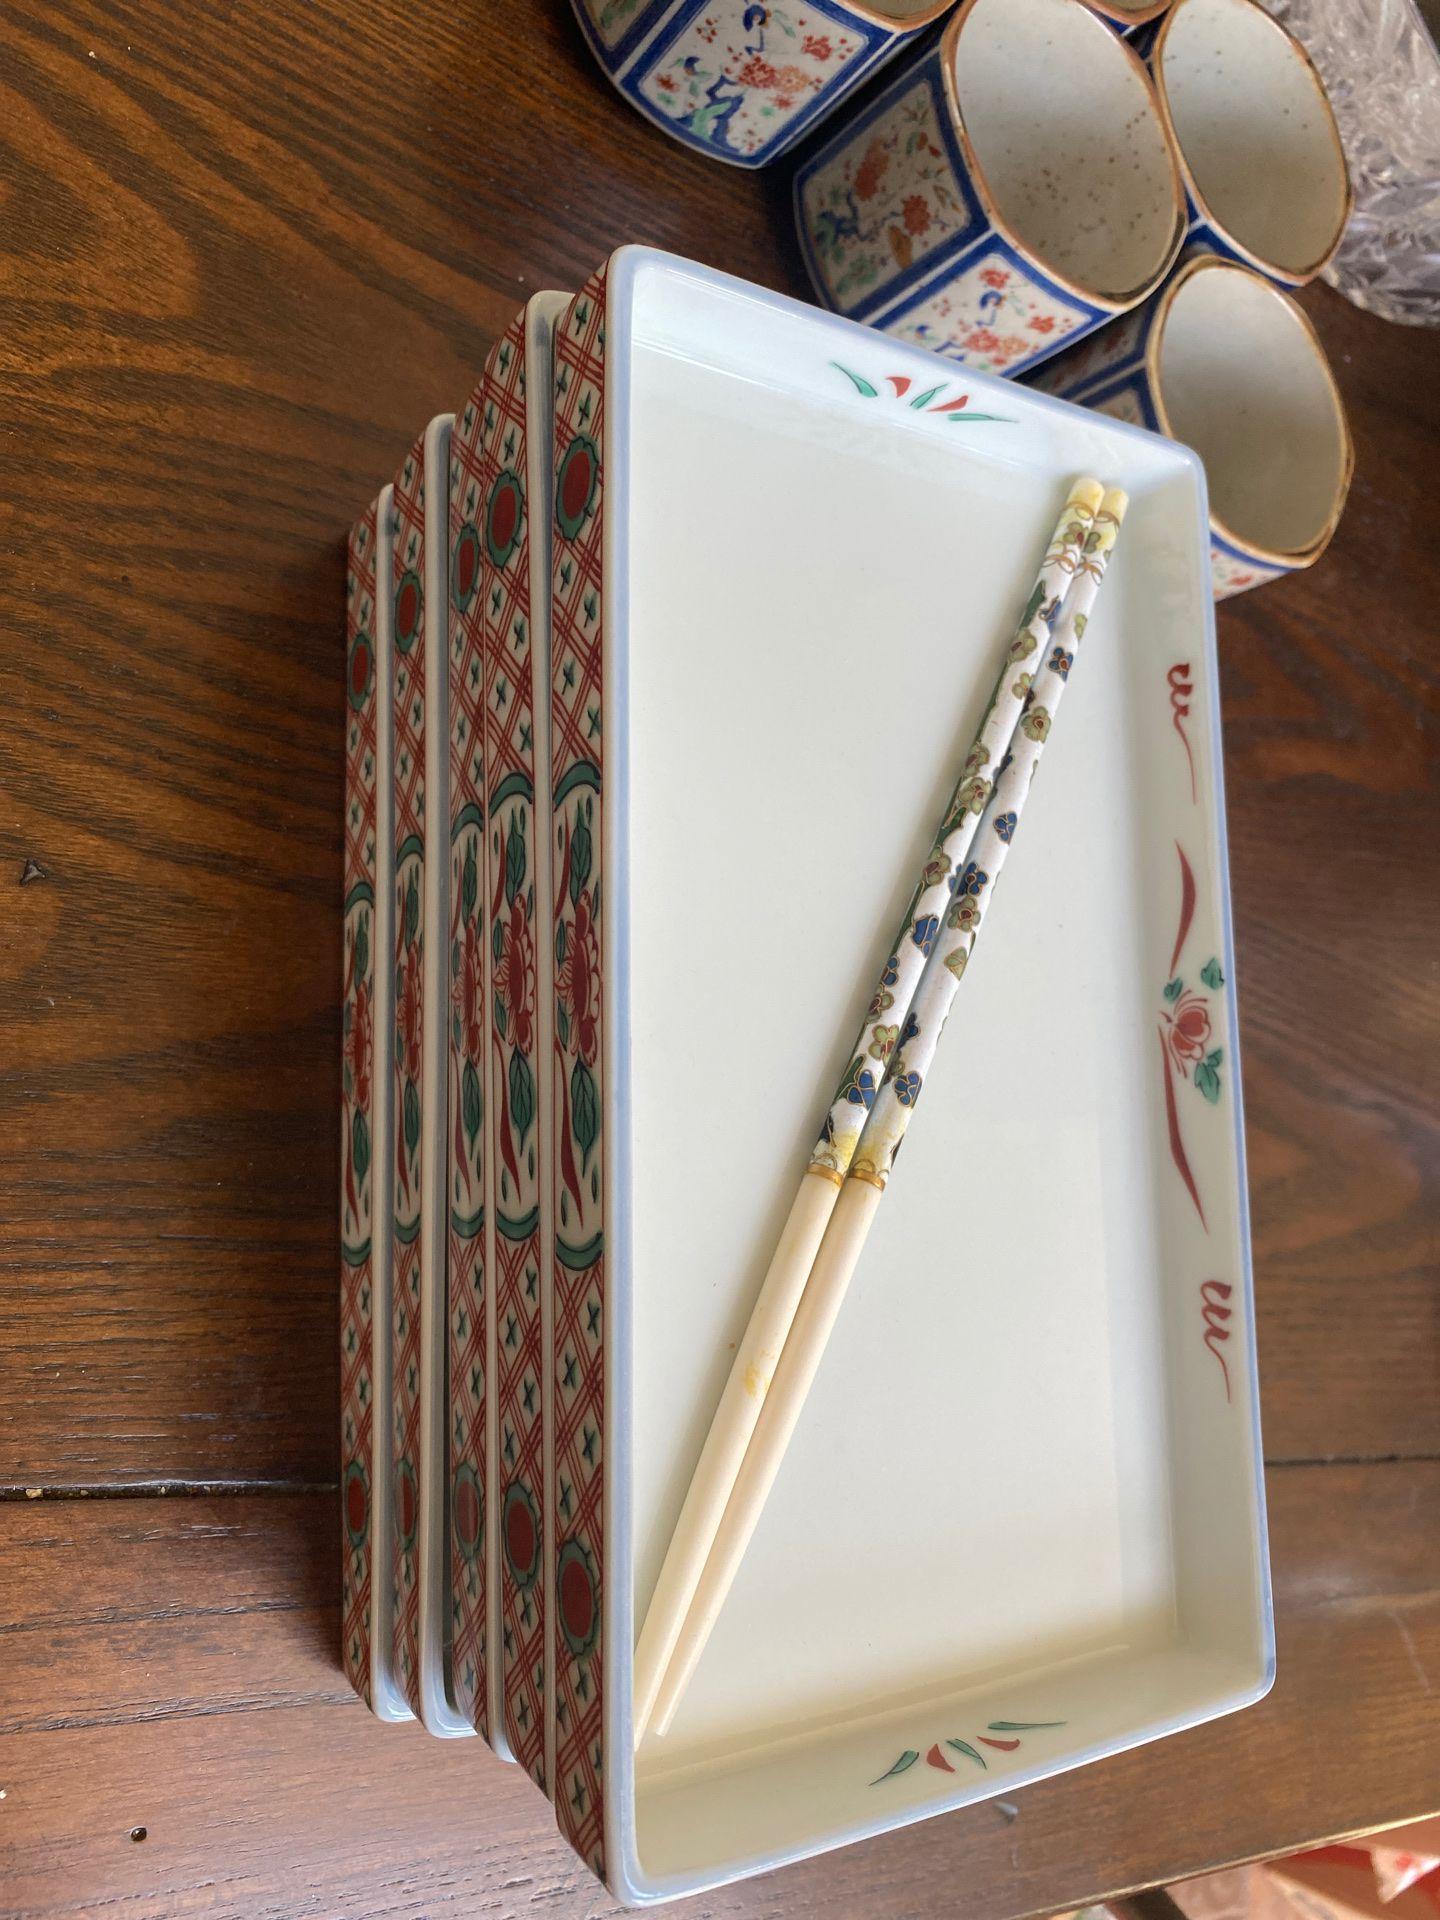 5 piece sushi set. Beautiful chopsticks. Authentic Japanese.